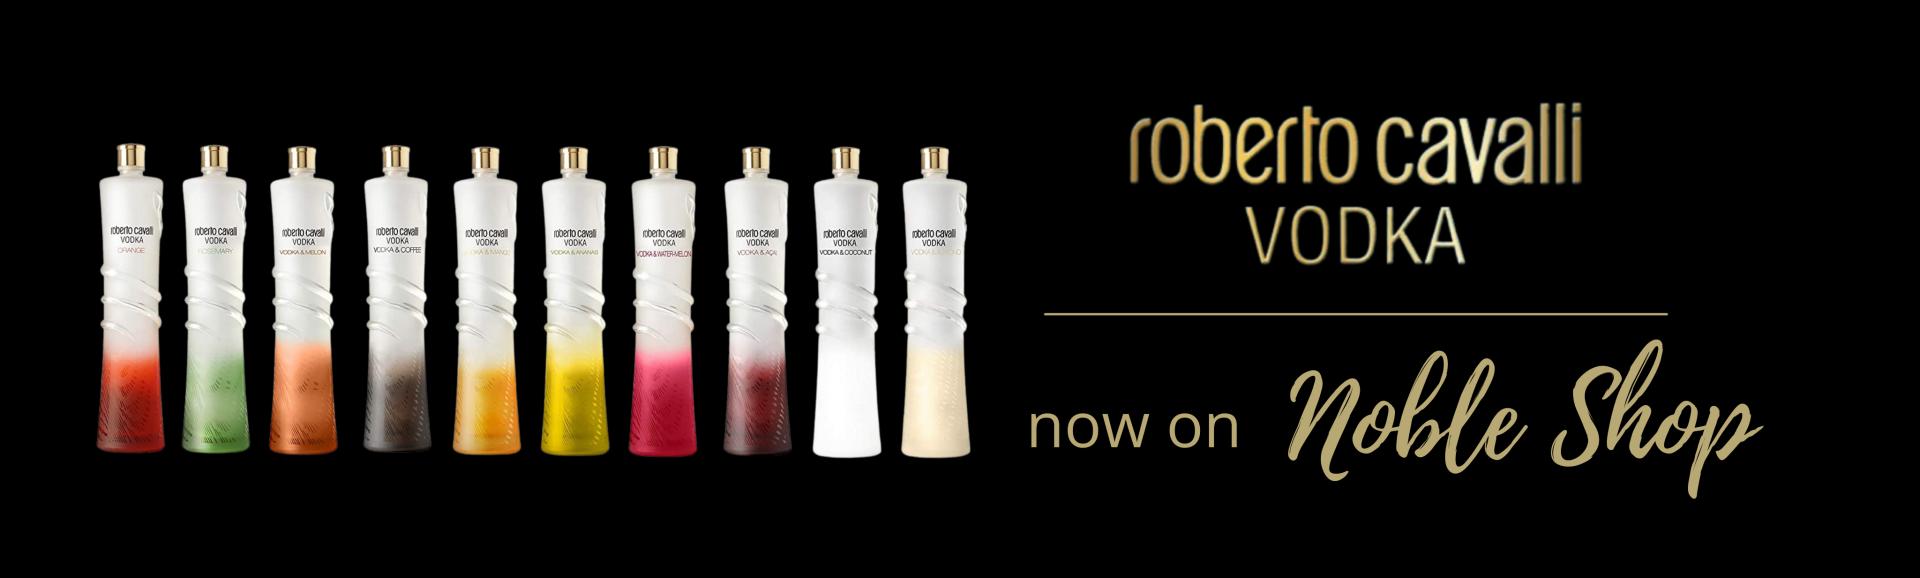 Roberto Cavalli Flavors